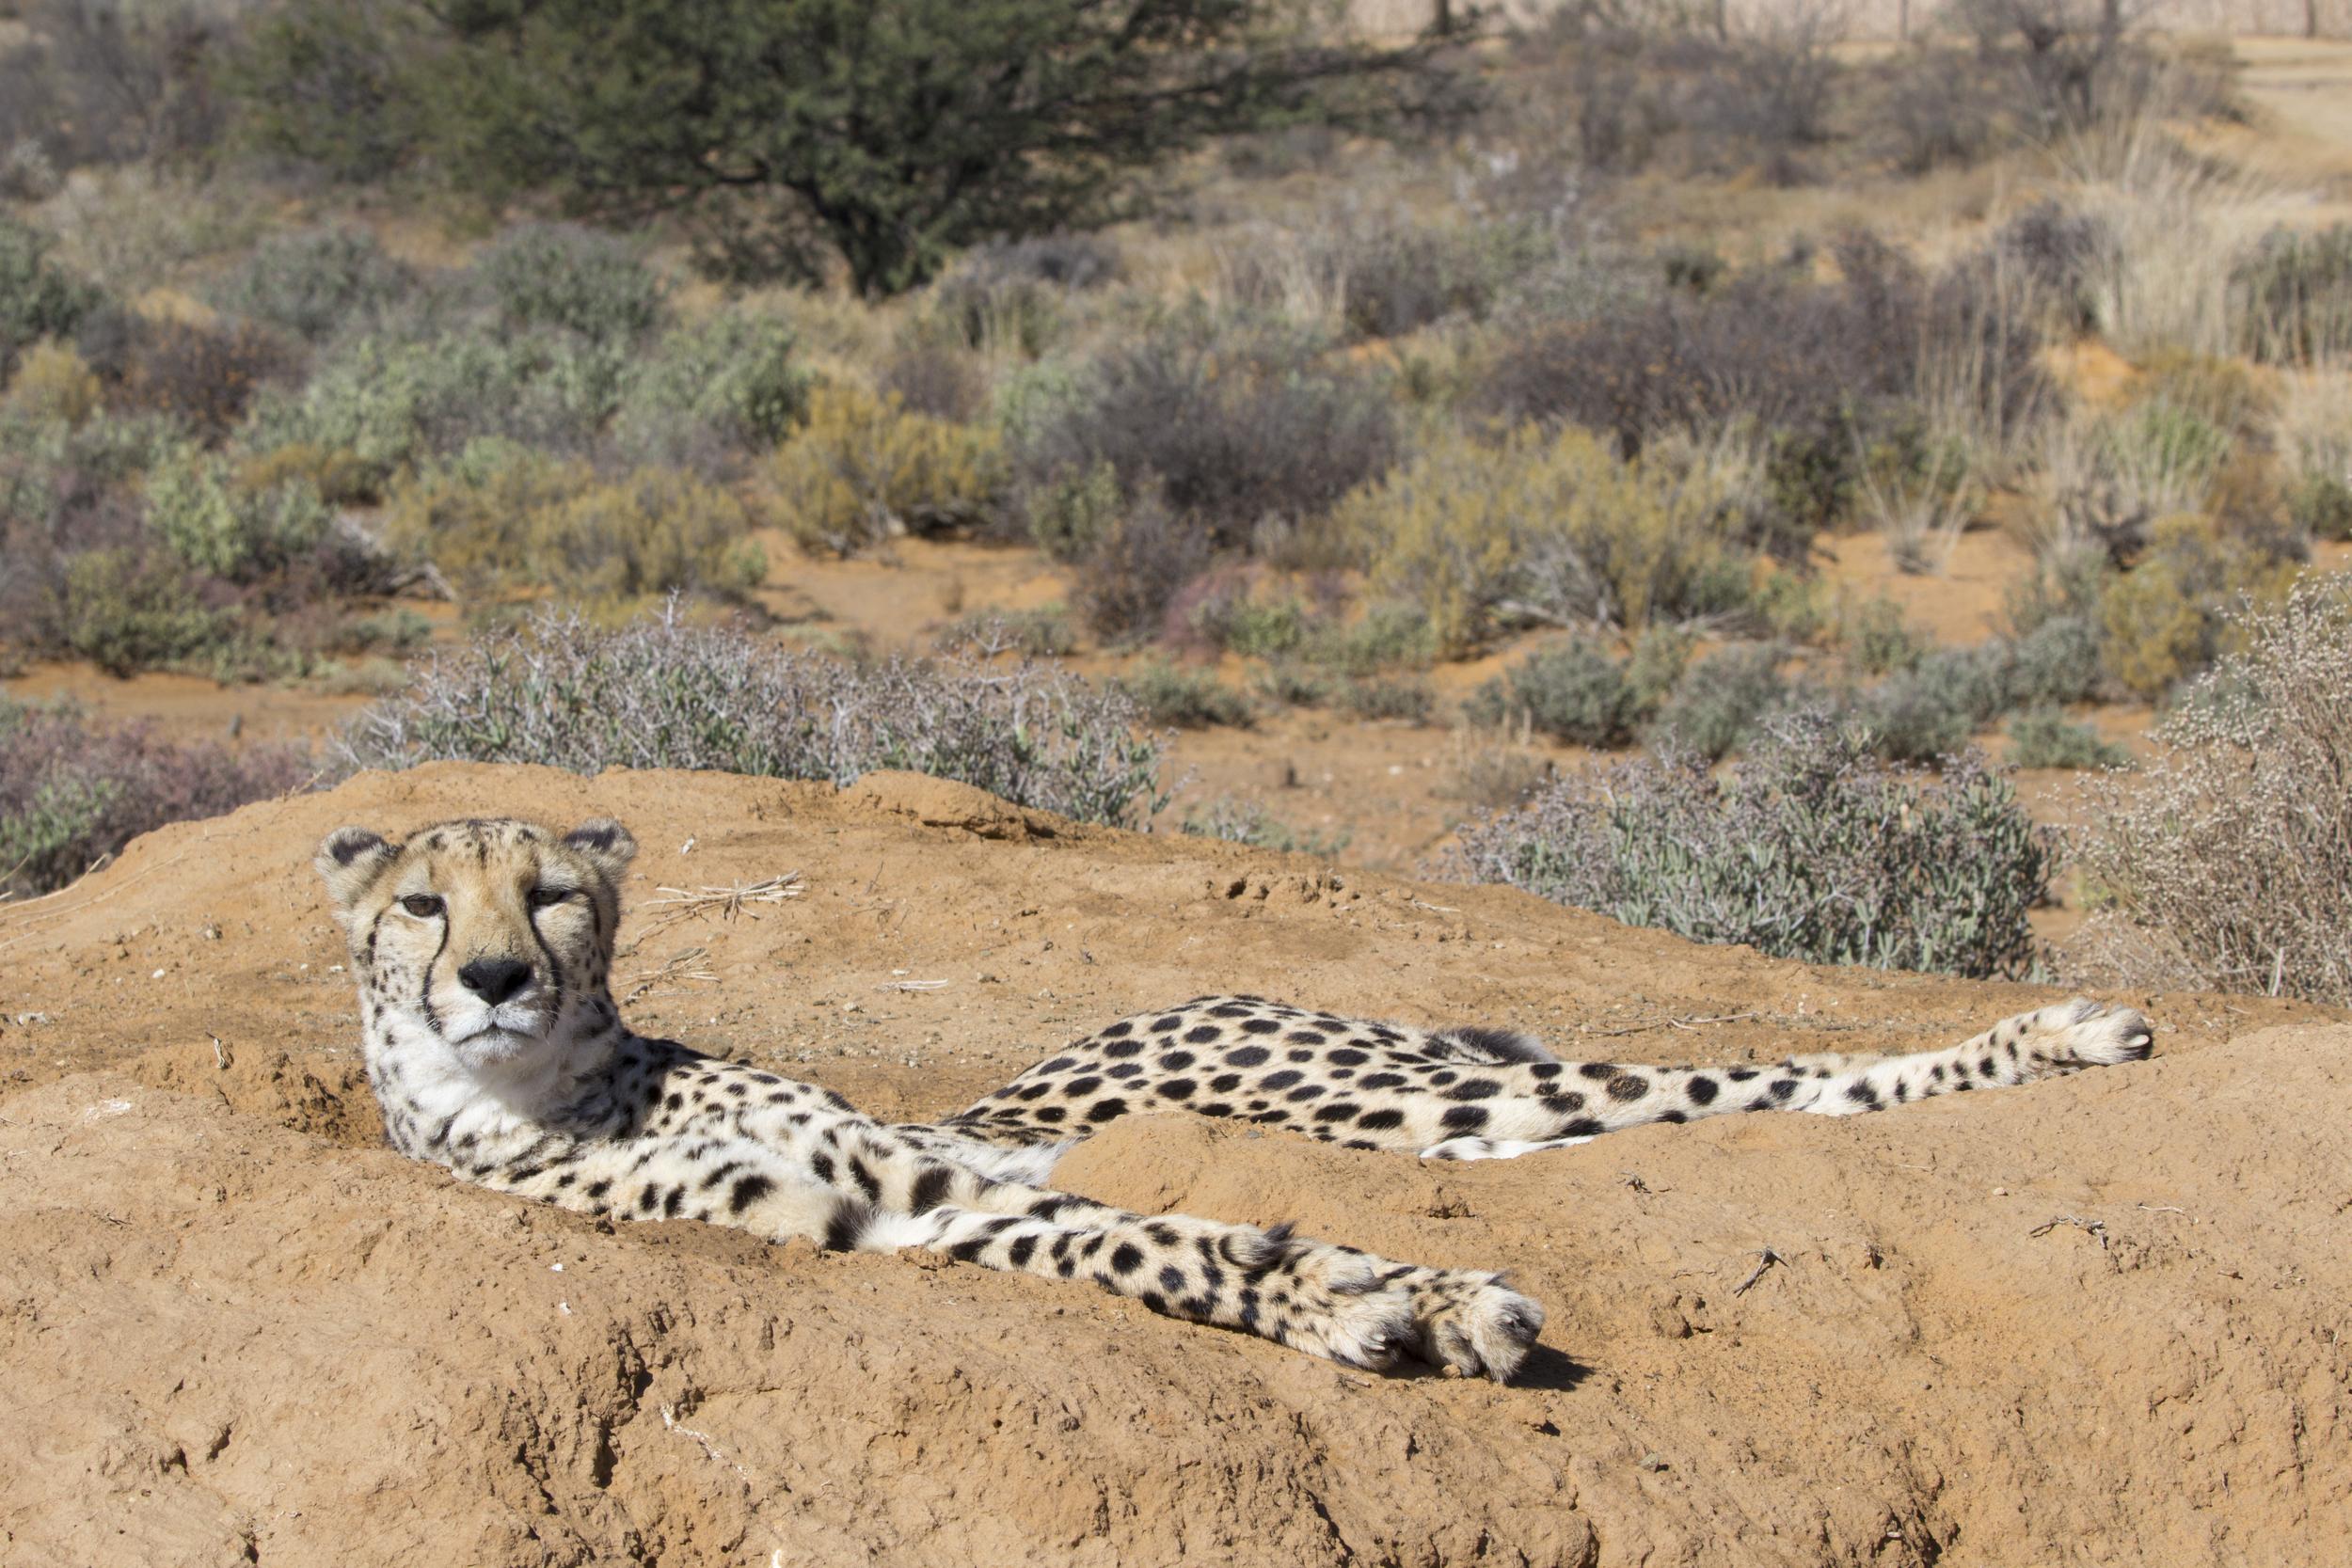 Cheetah IMG_5415.jpg